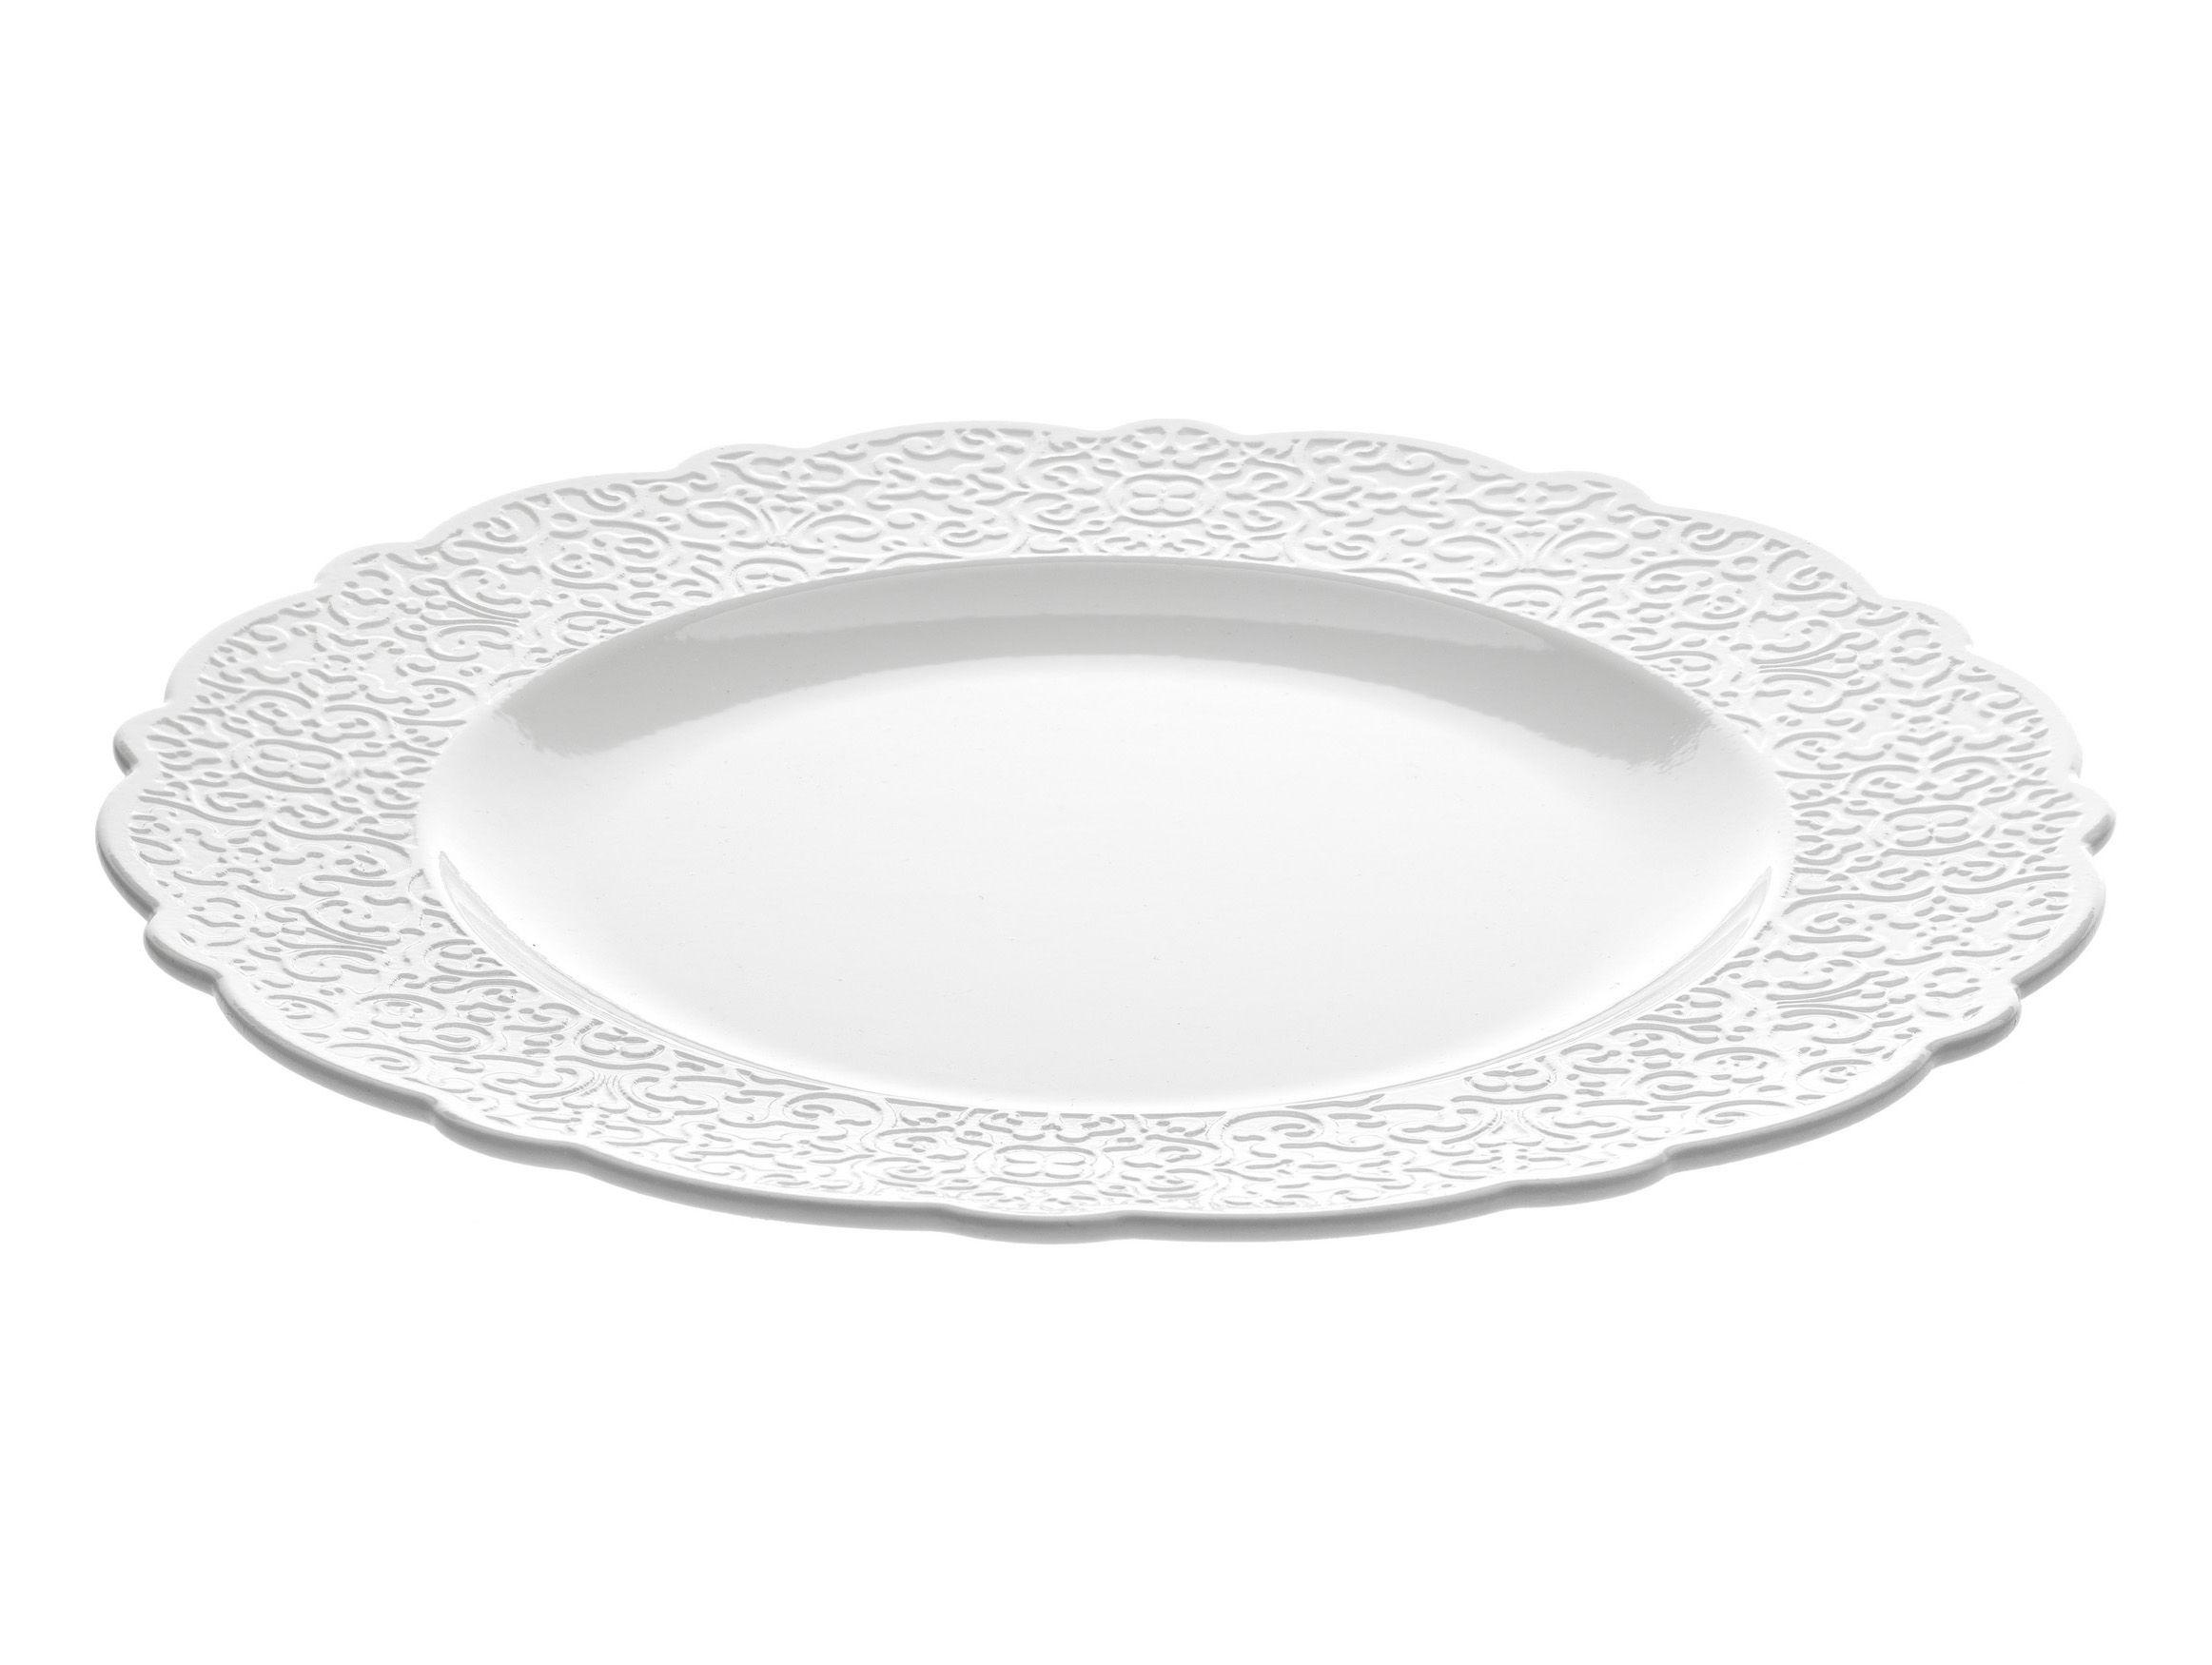 Tavola - Piatti  - Piatto Dressed - Ø 27 cm di Alessi - Piatto Ø 27 cm - Bianco - Porcellana